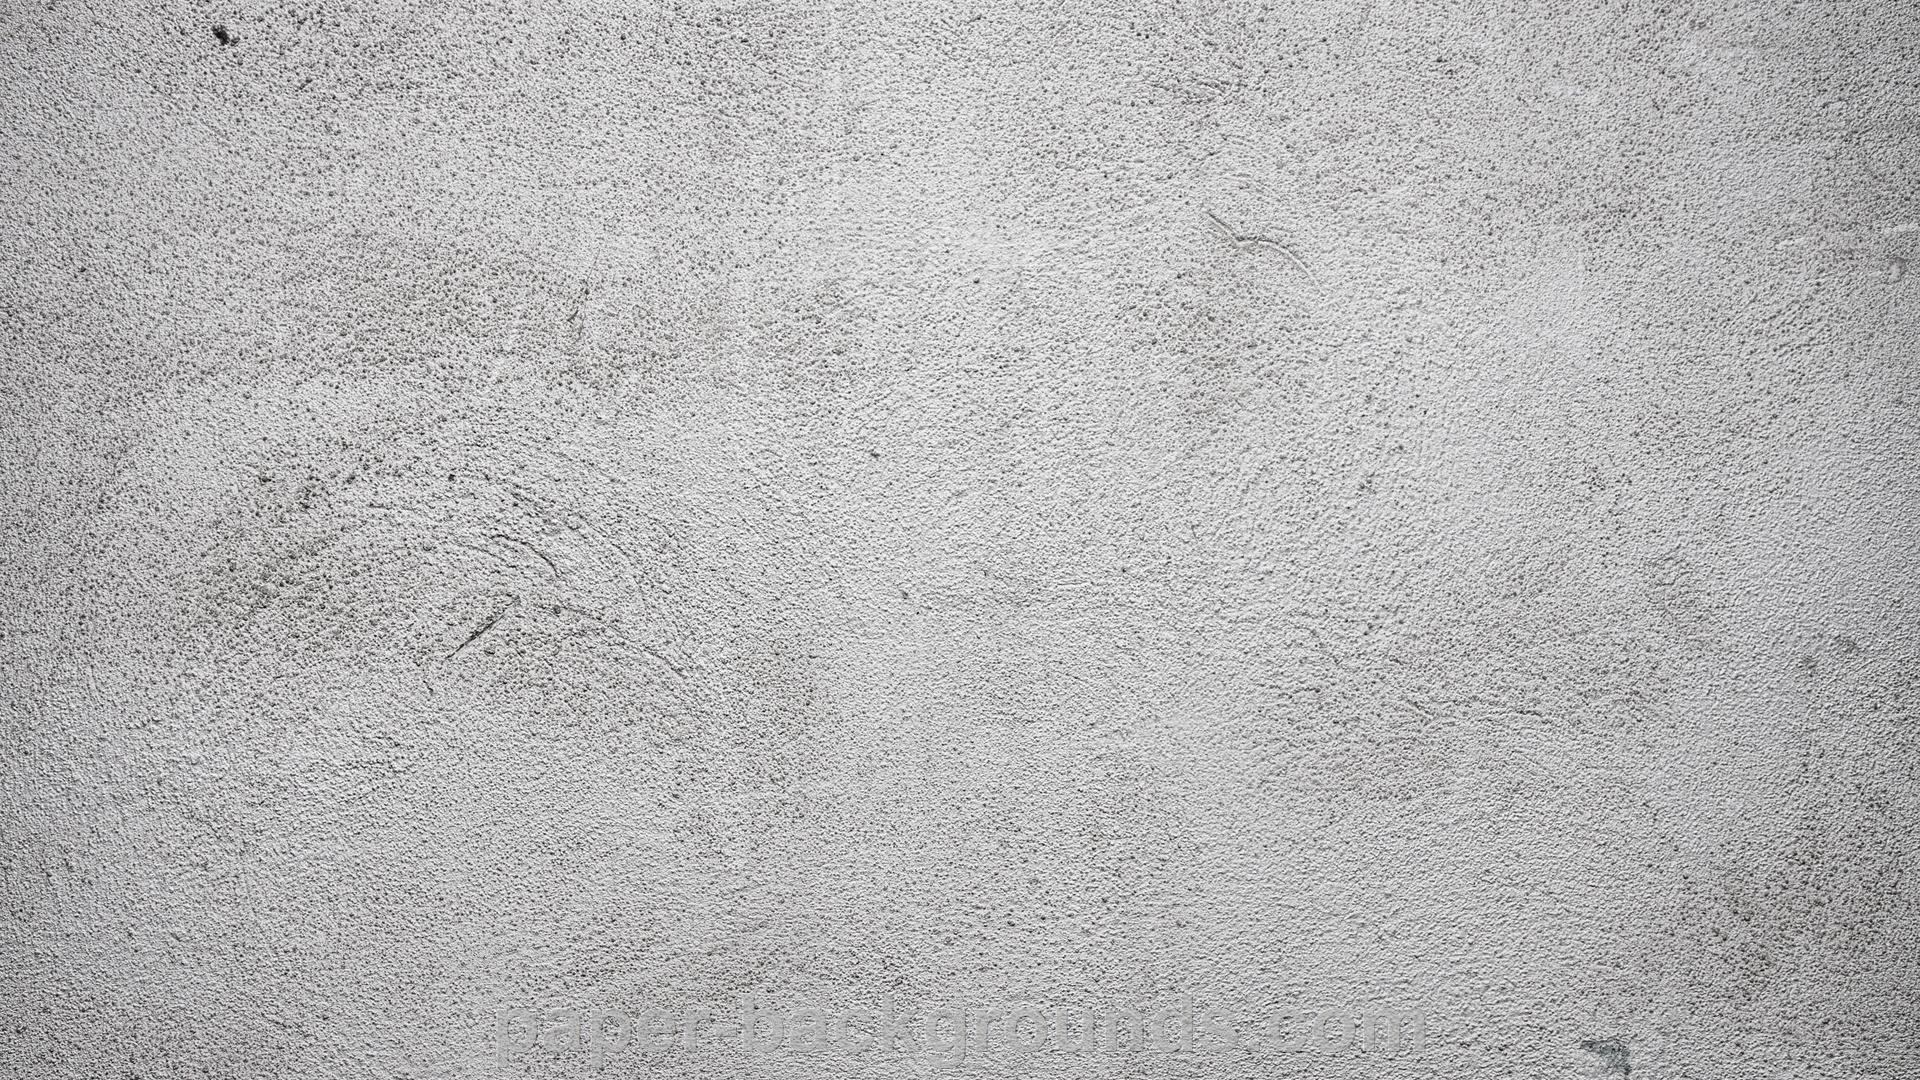 White Gray Concrete Wall Texture Frank Marino